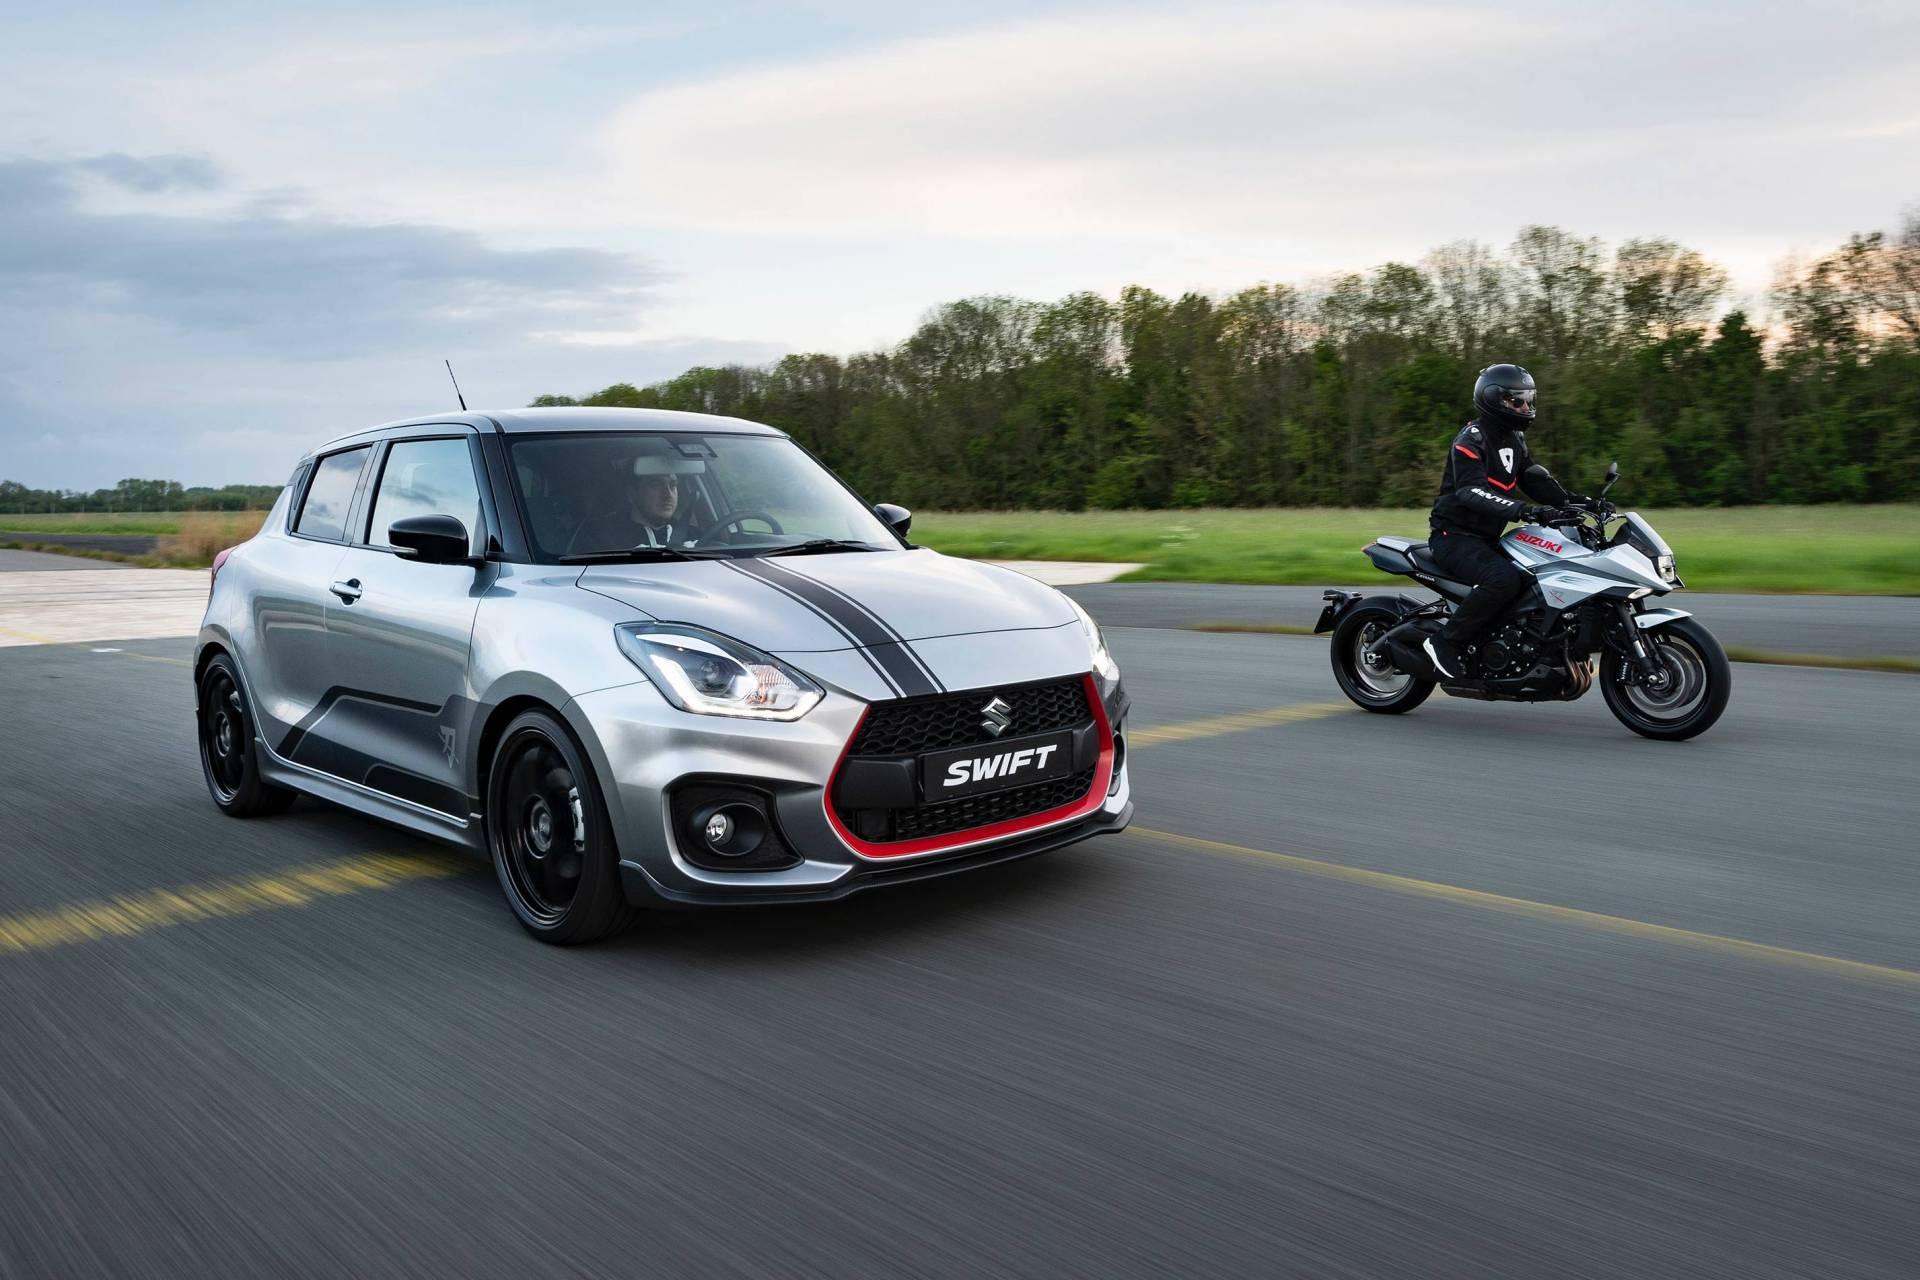 2019 Suzuki Swift Sport Gets Katana Edition In The